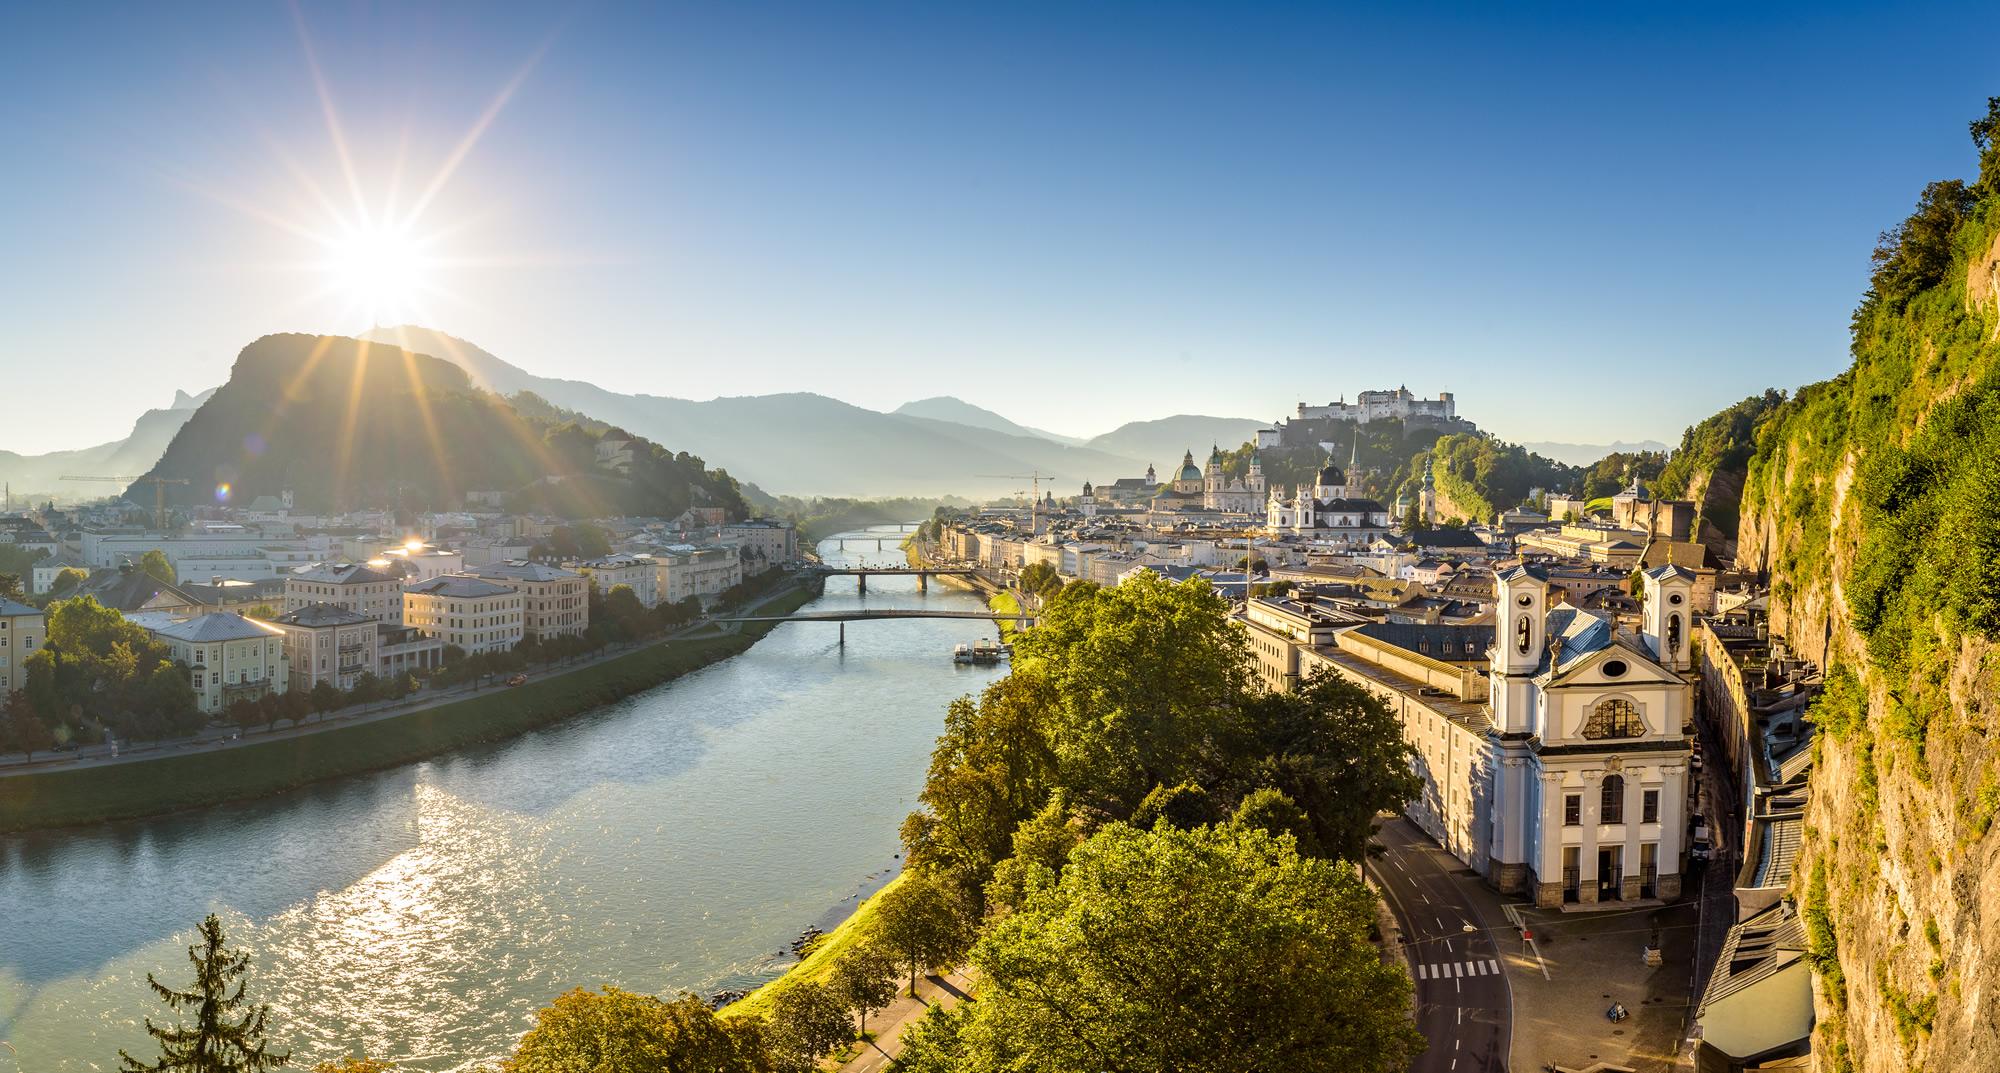 Panoramic view from Salzburg, Austria